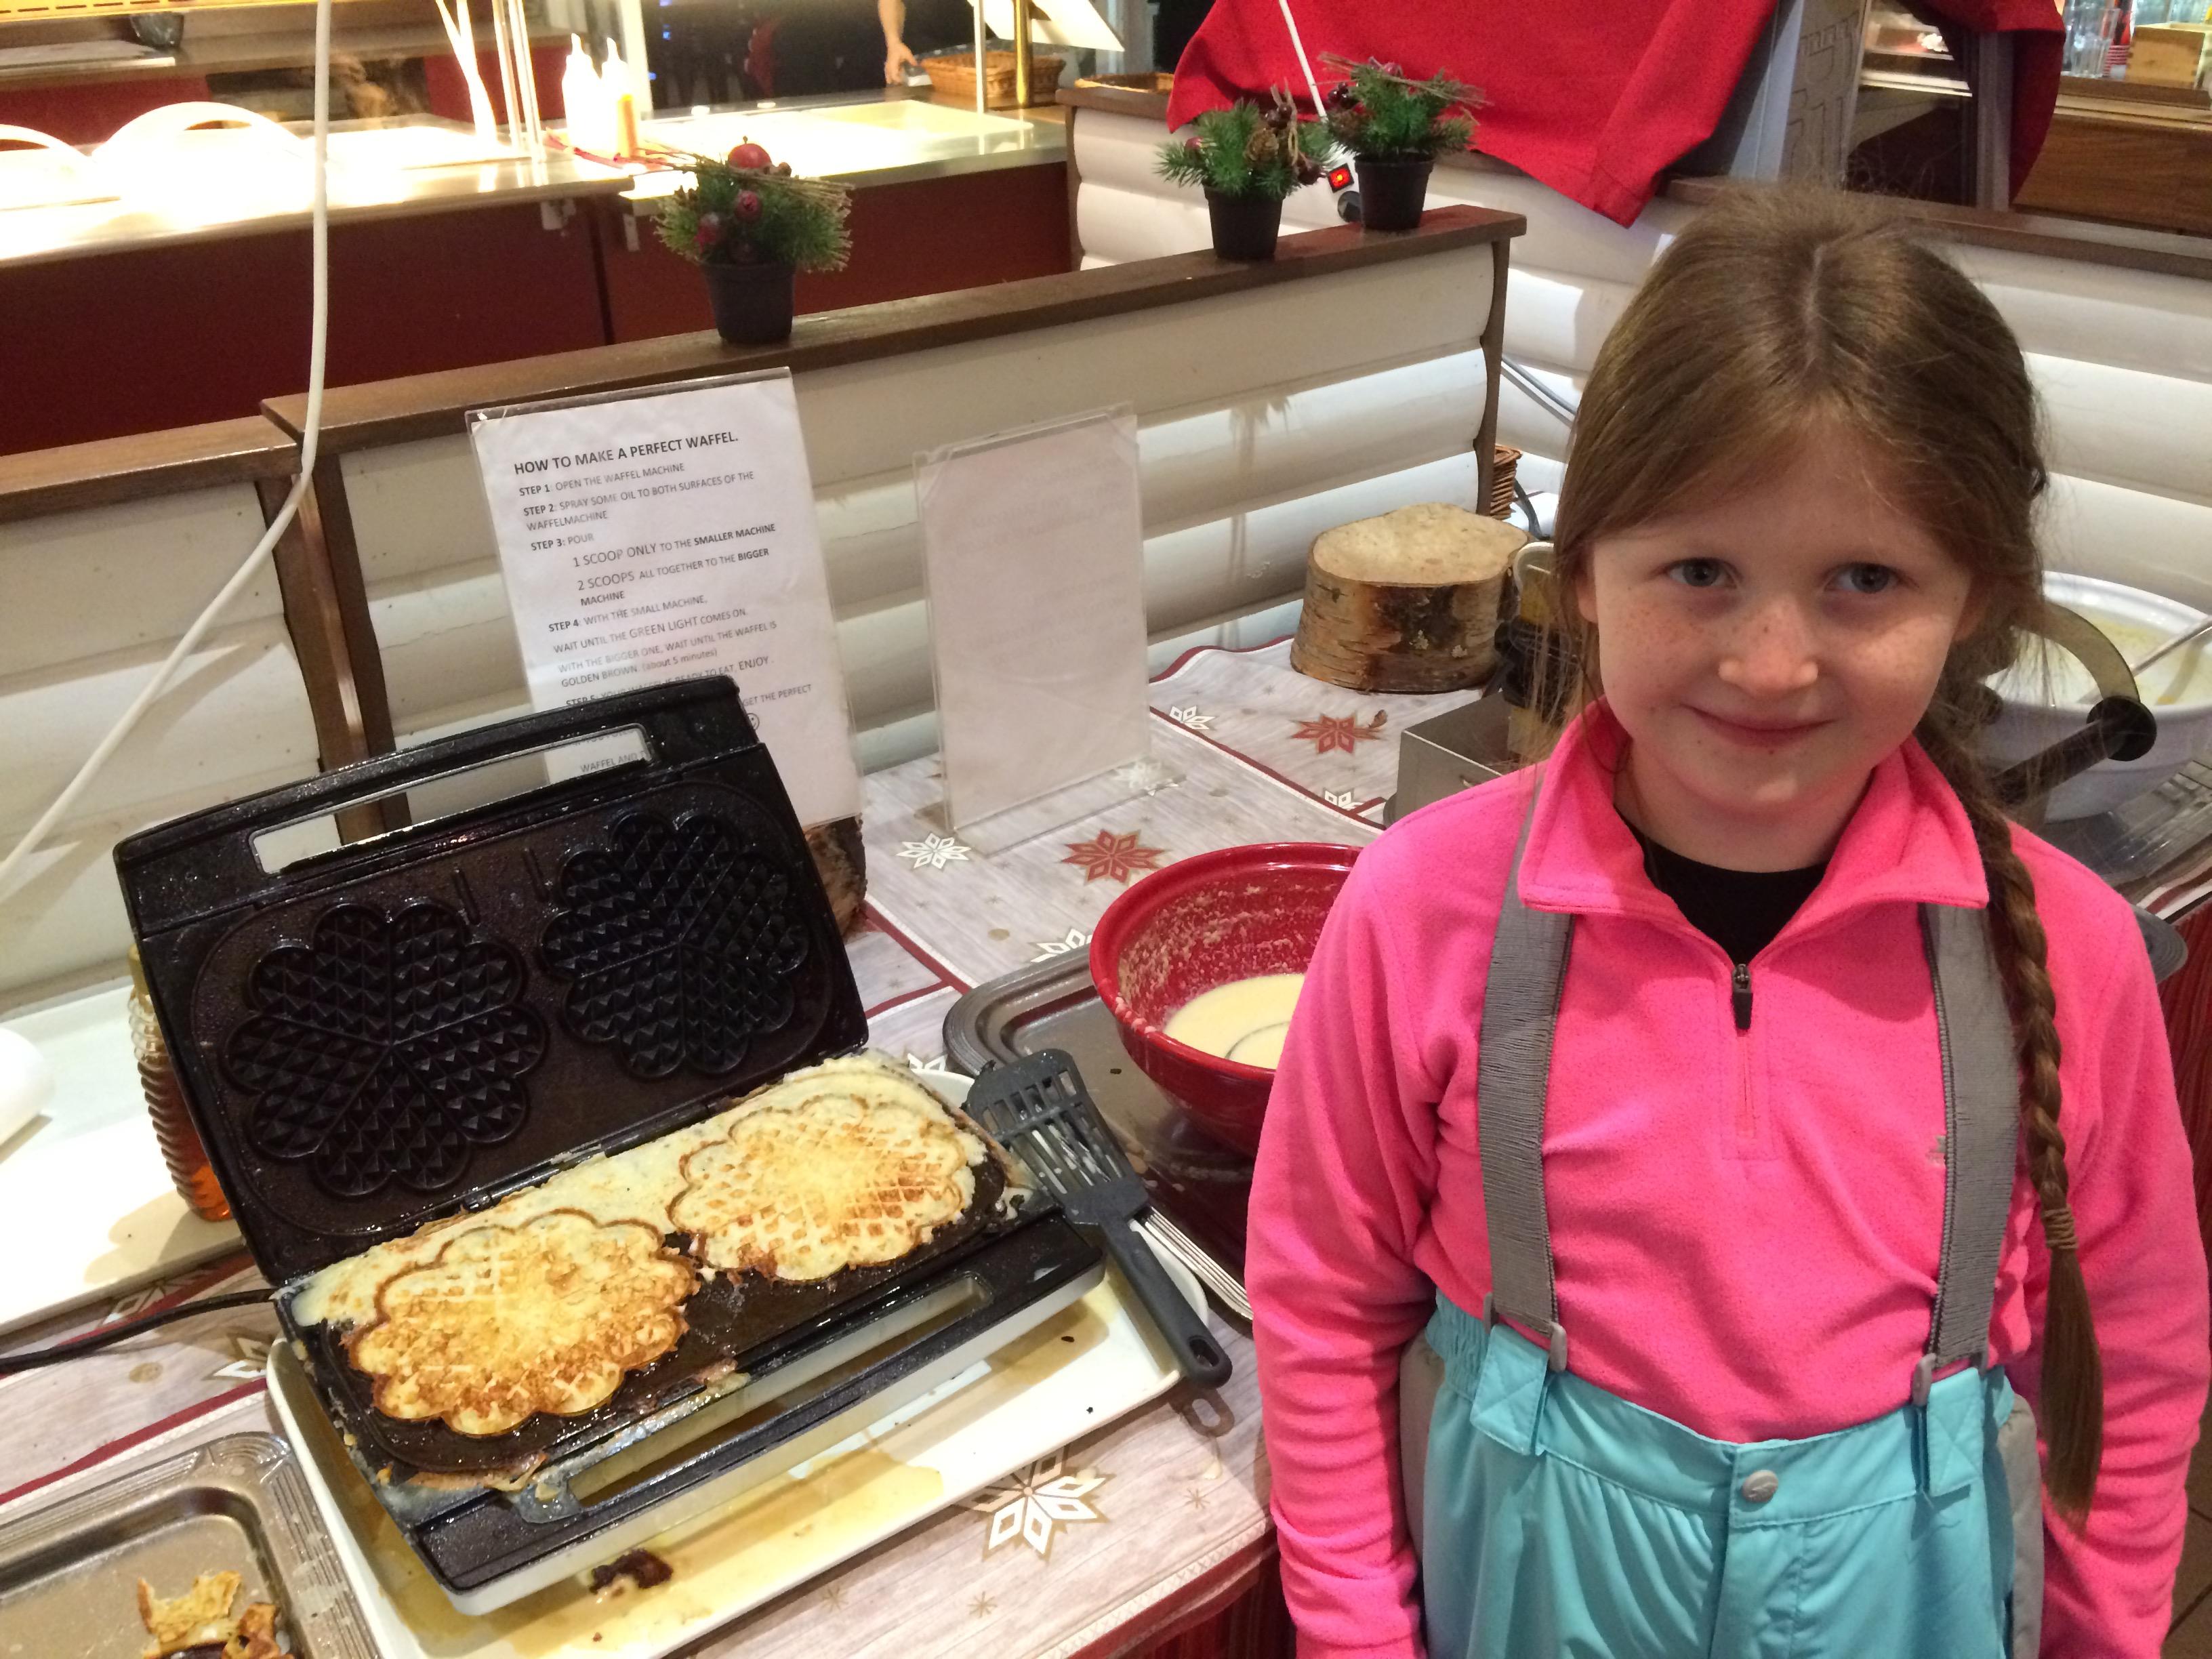 Breakfast waffles from the restaurant at Santa Claus Holiday Village in Rovaniemi, Finland